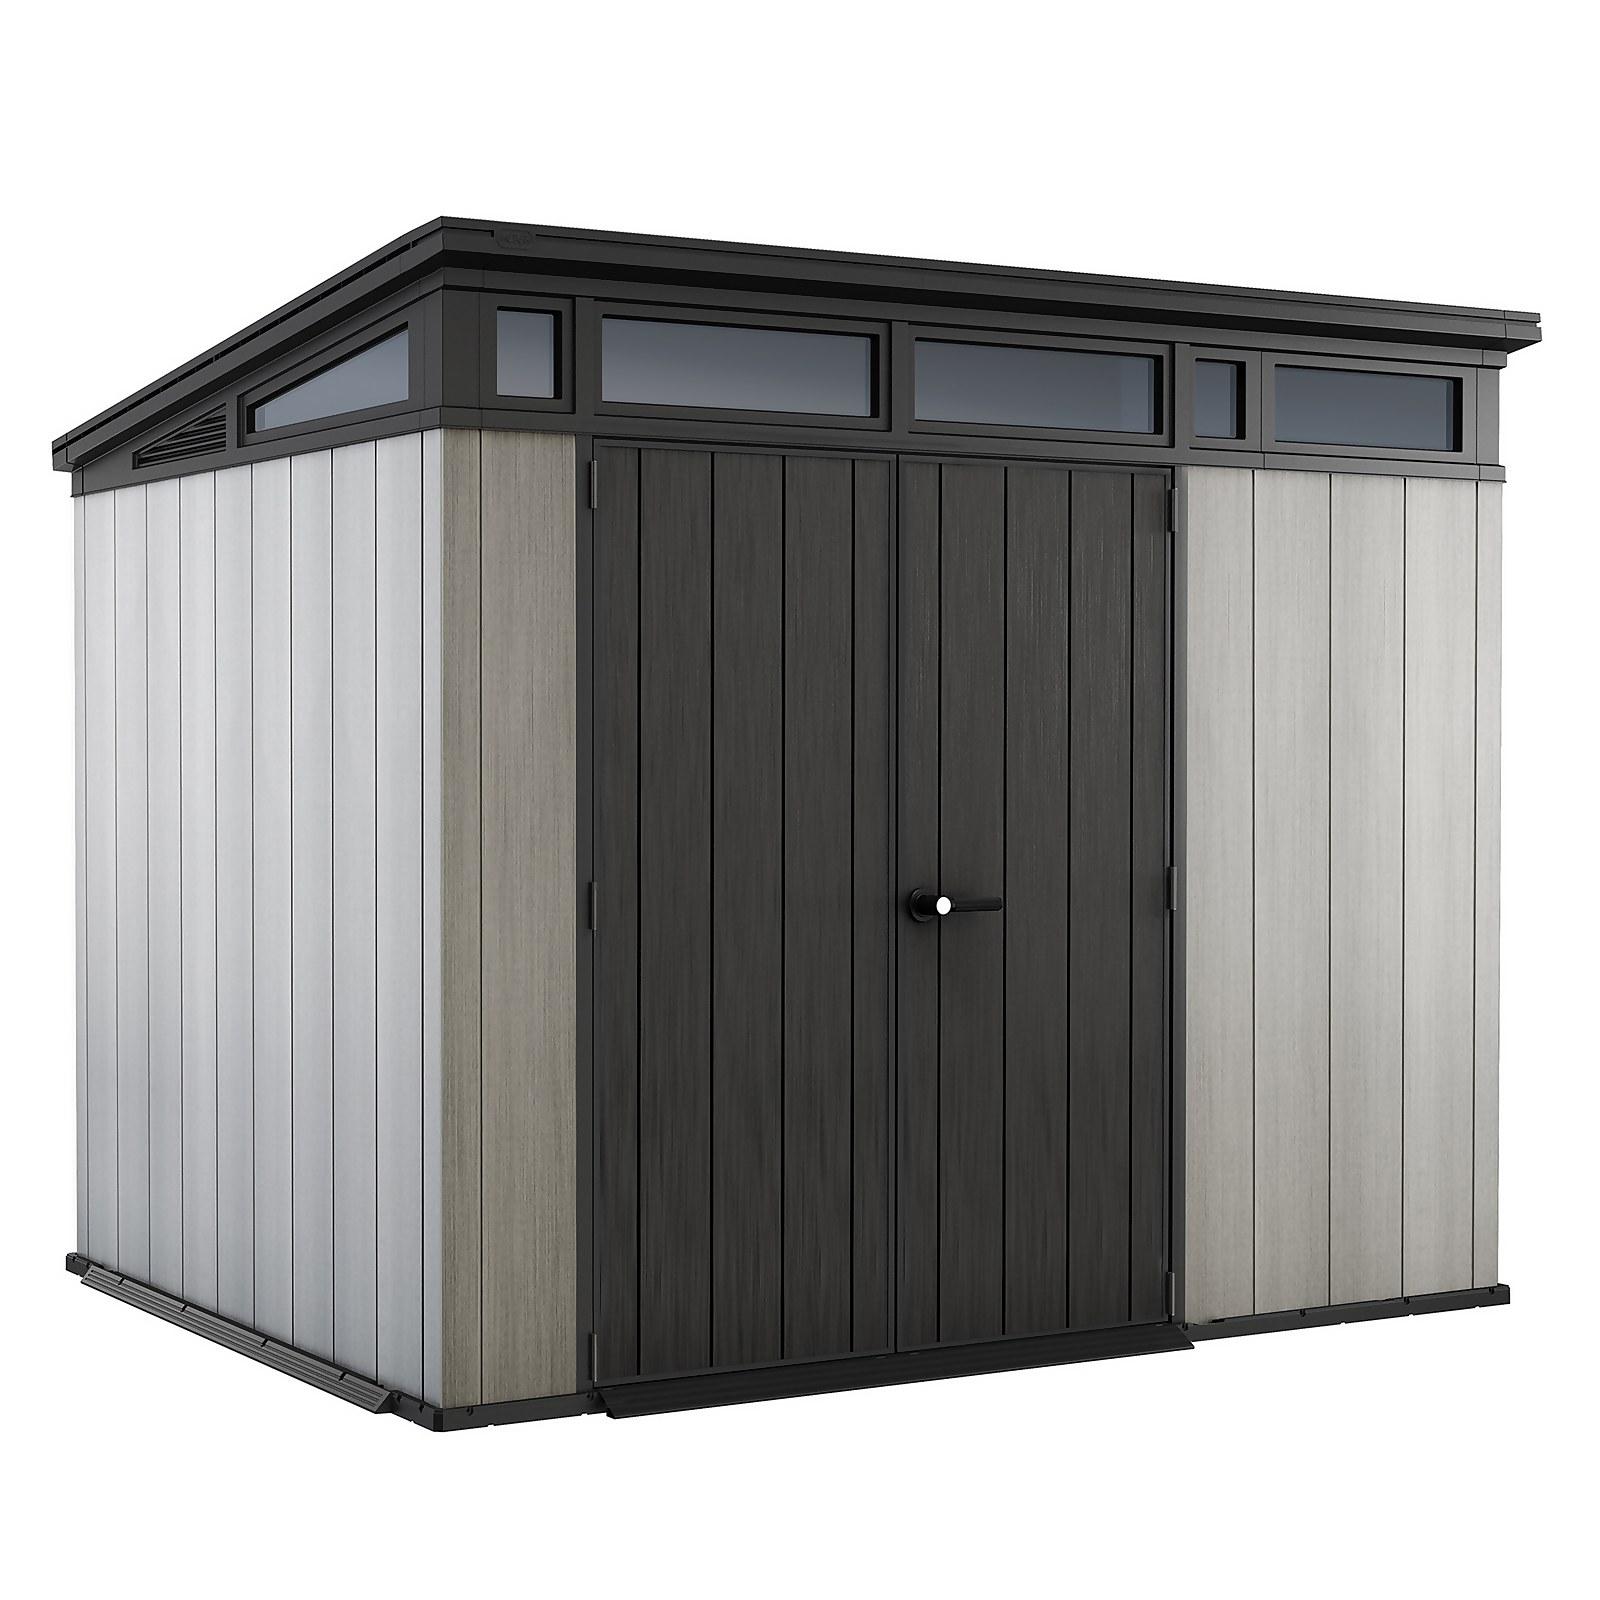 Keter Artisan 9 x 7ft Outdoor Garden Storage Pent Shed - Grey